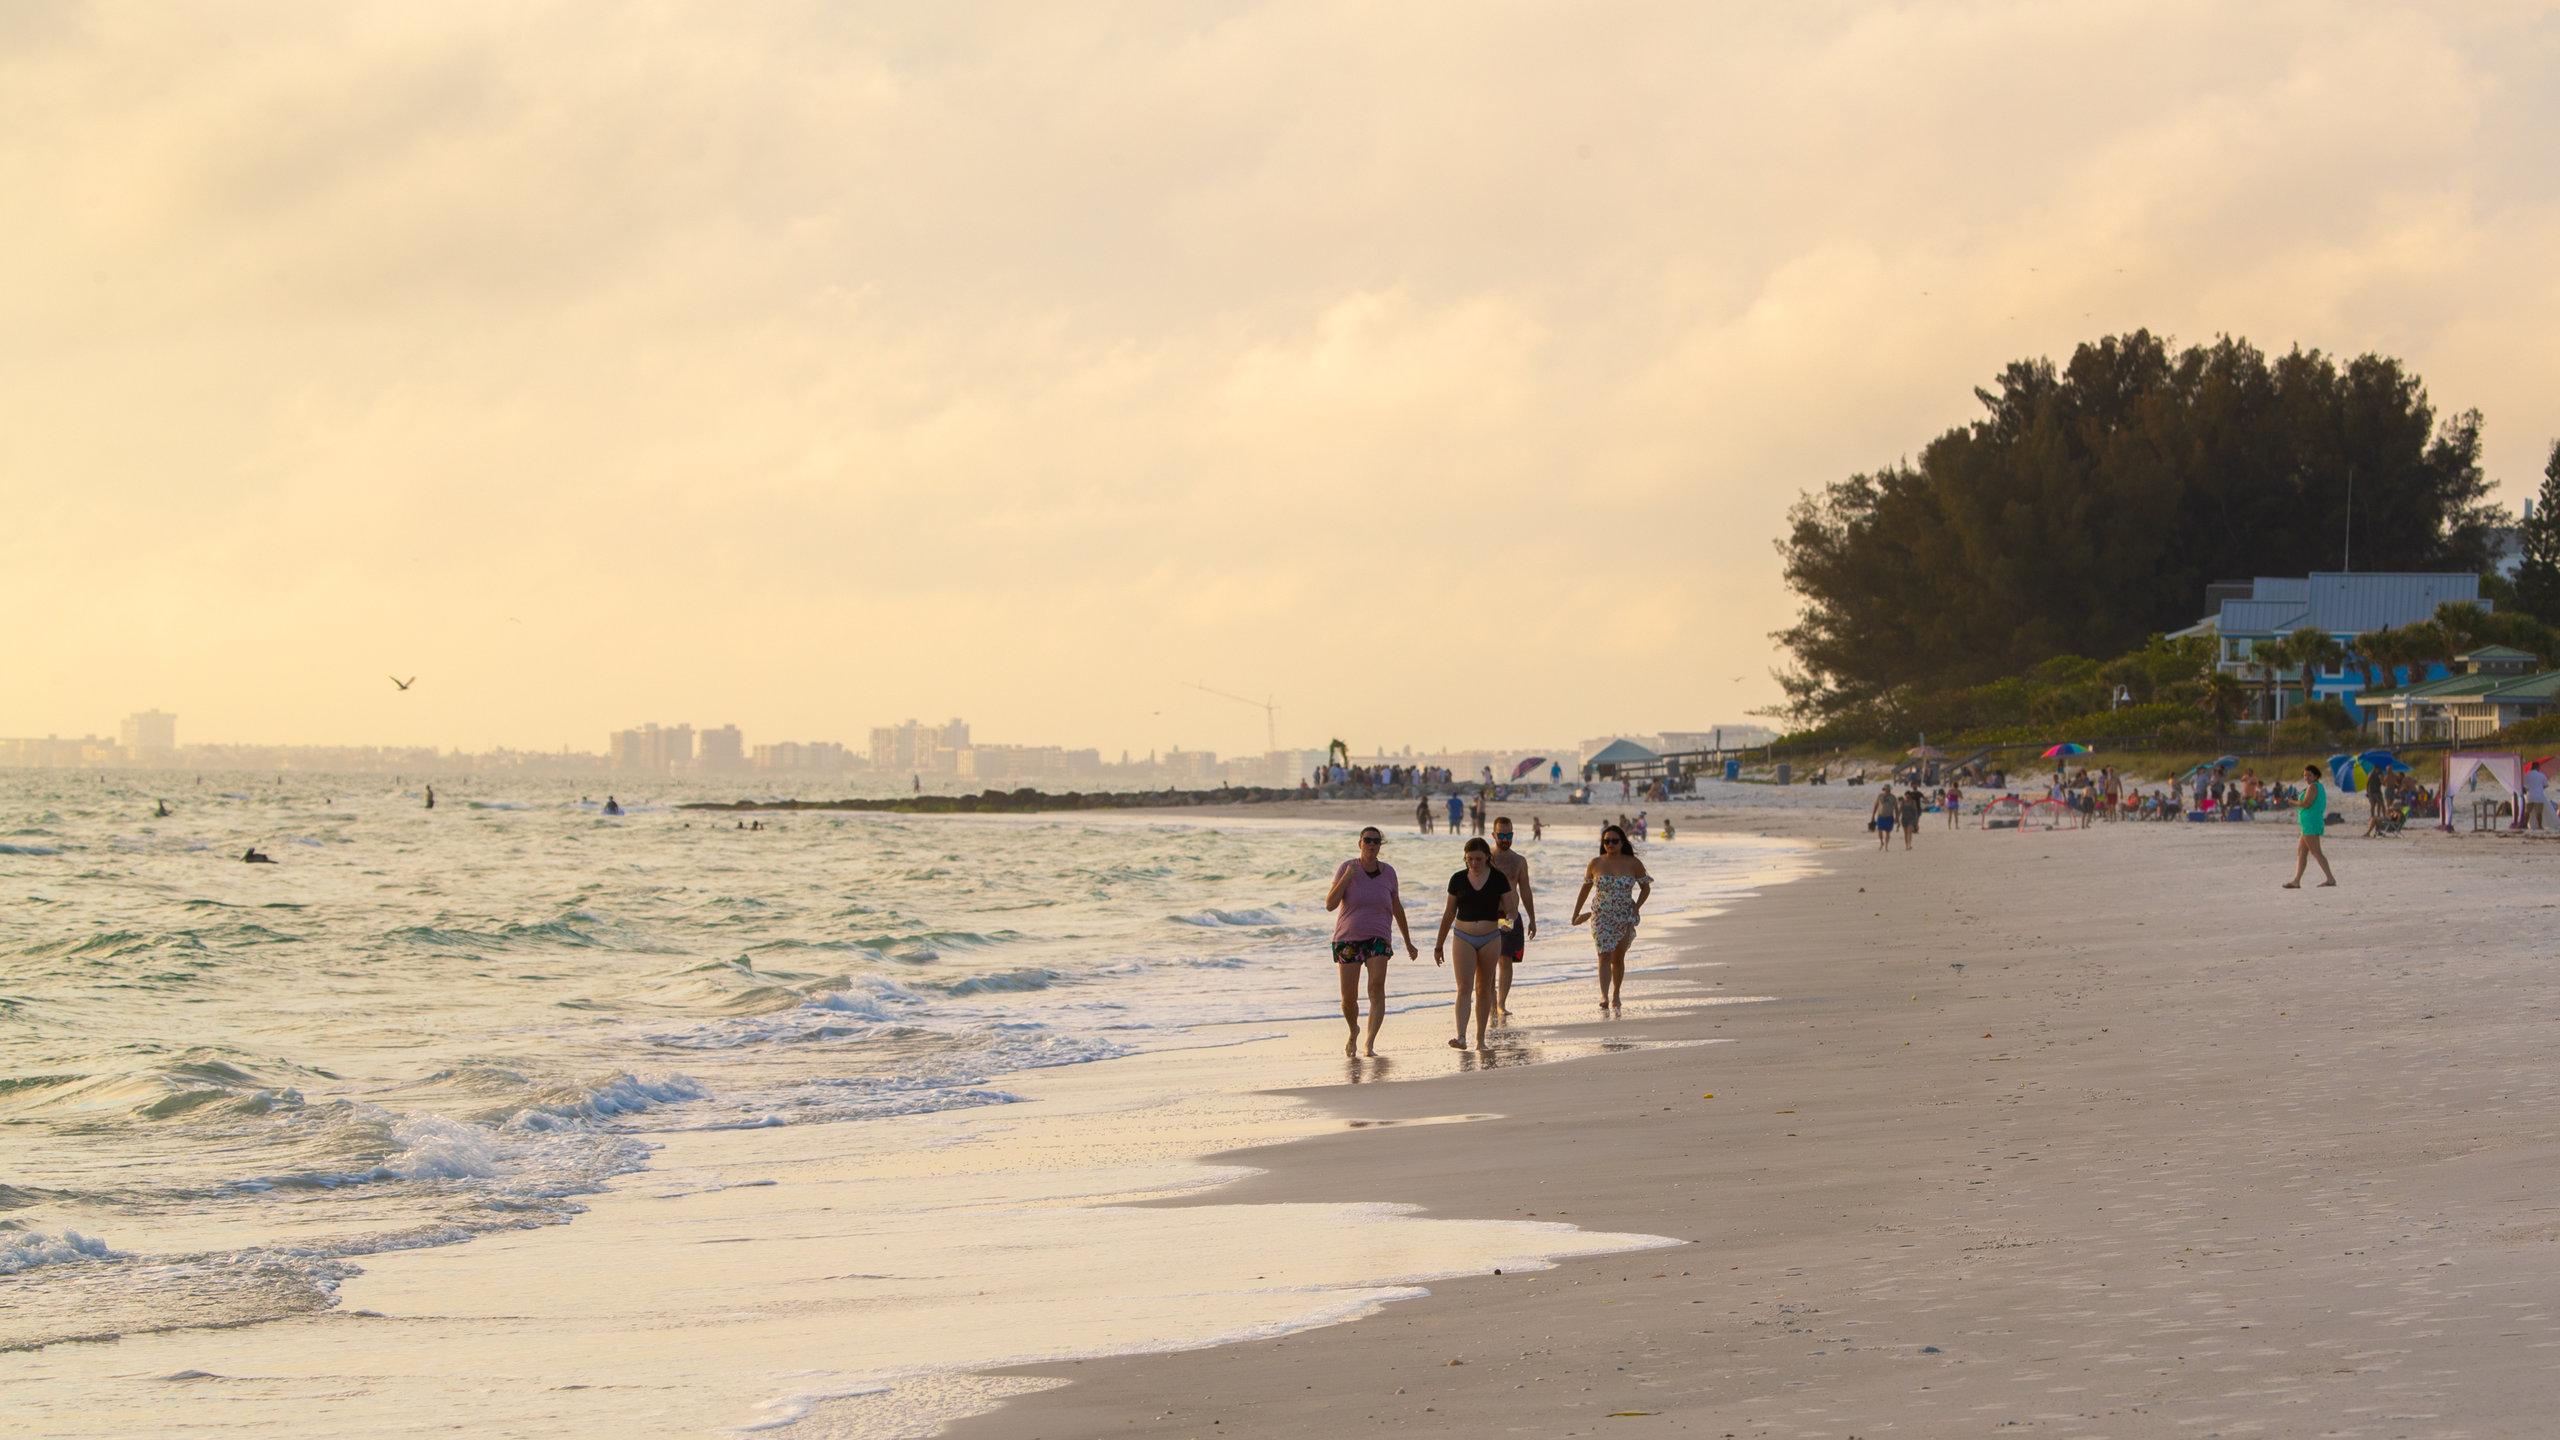 Sunset Beach, Treasure Island, Florida, USA